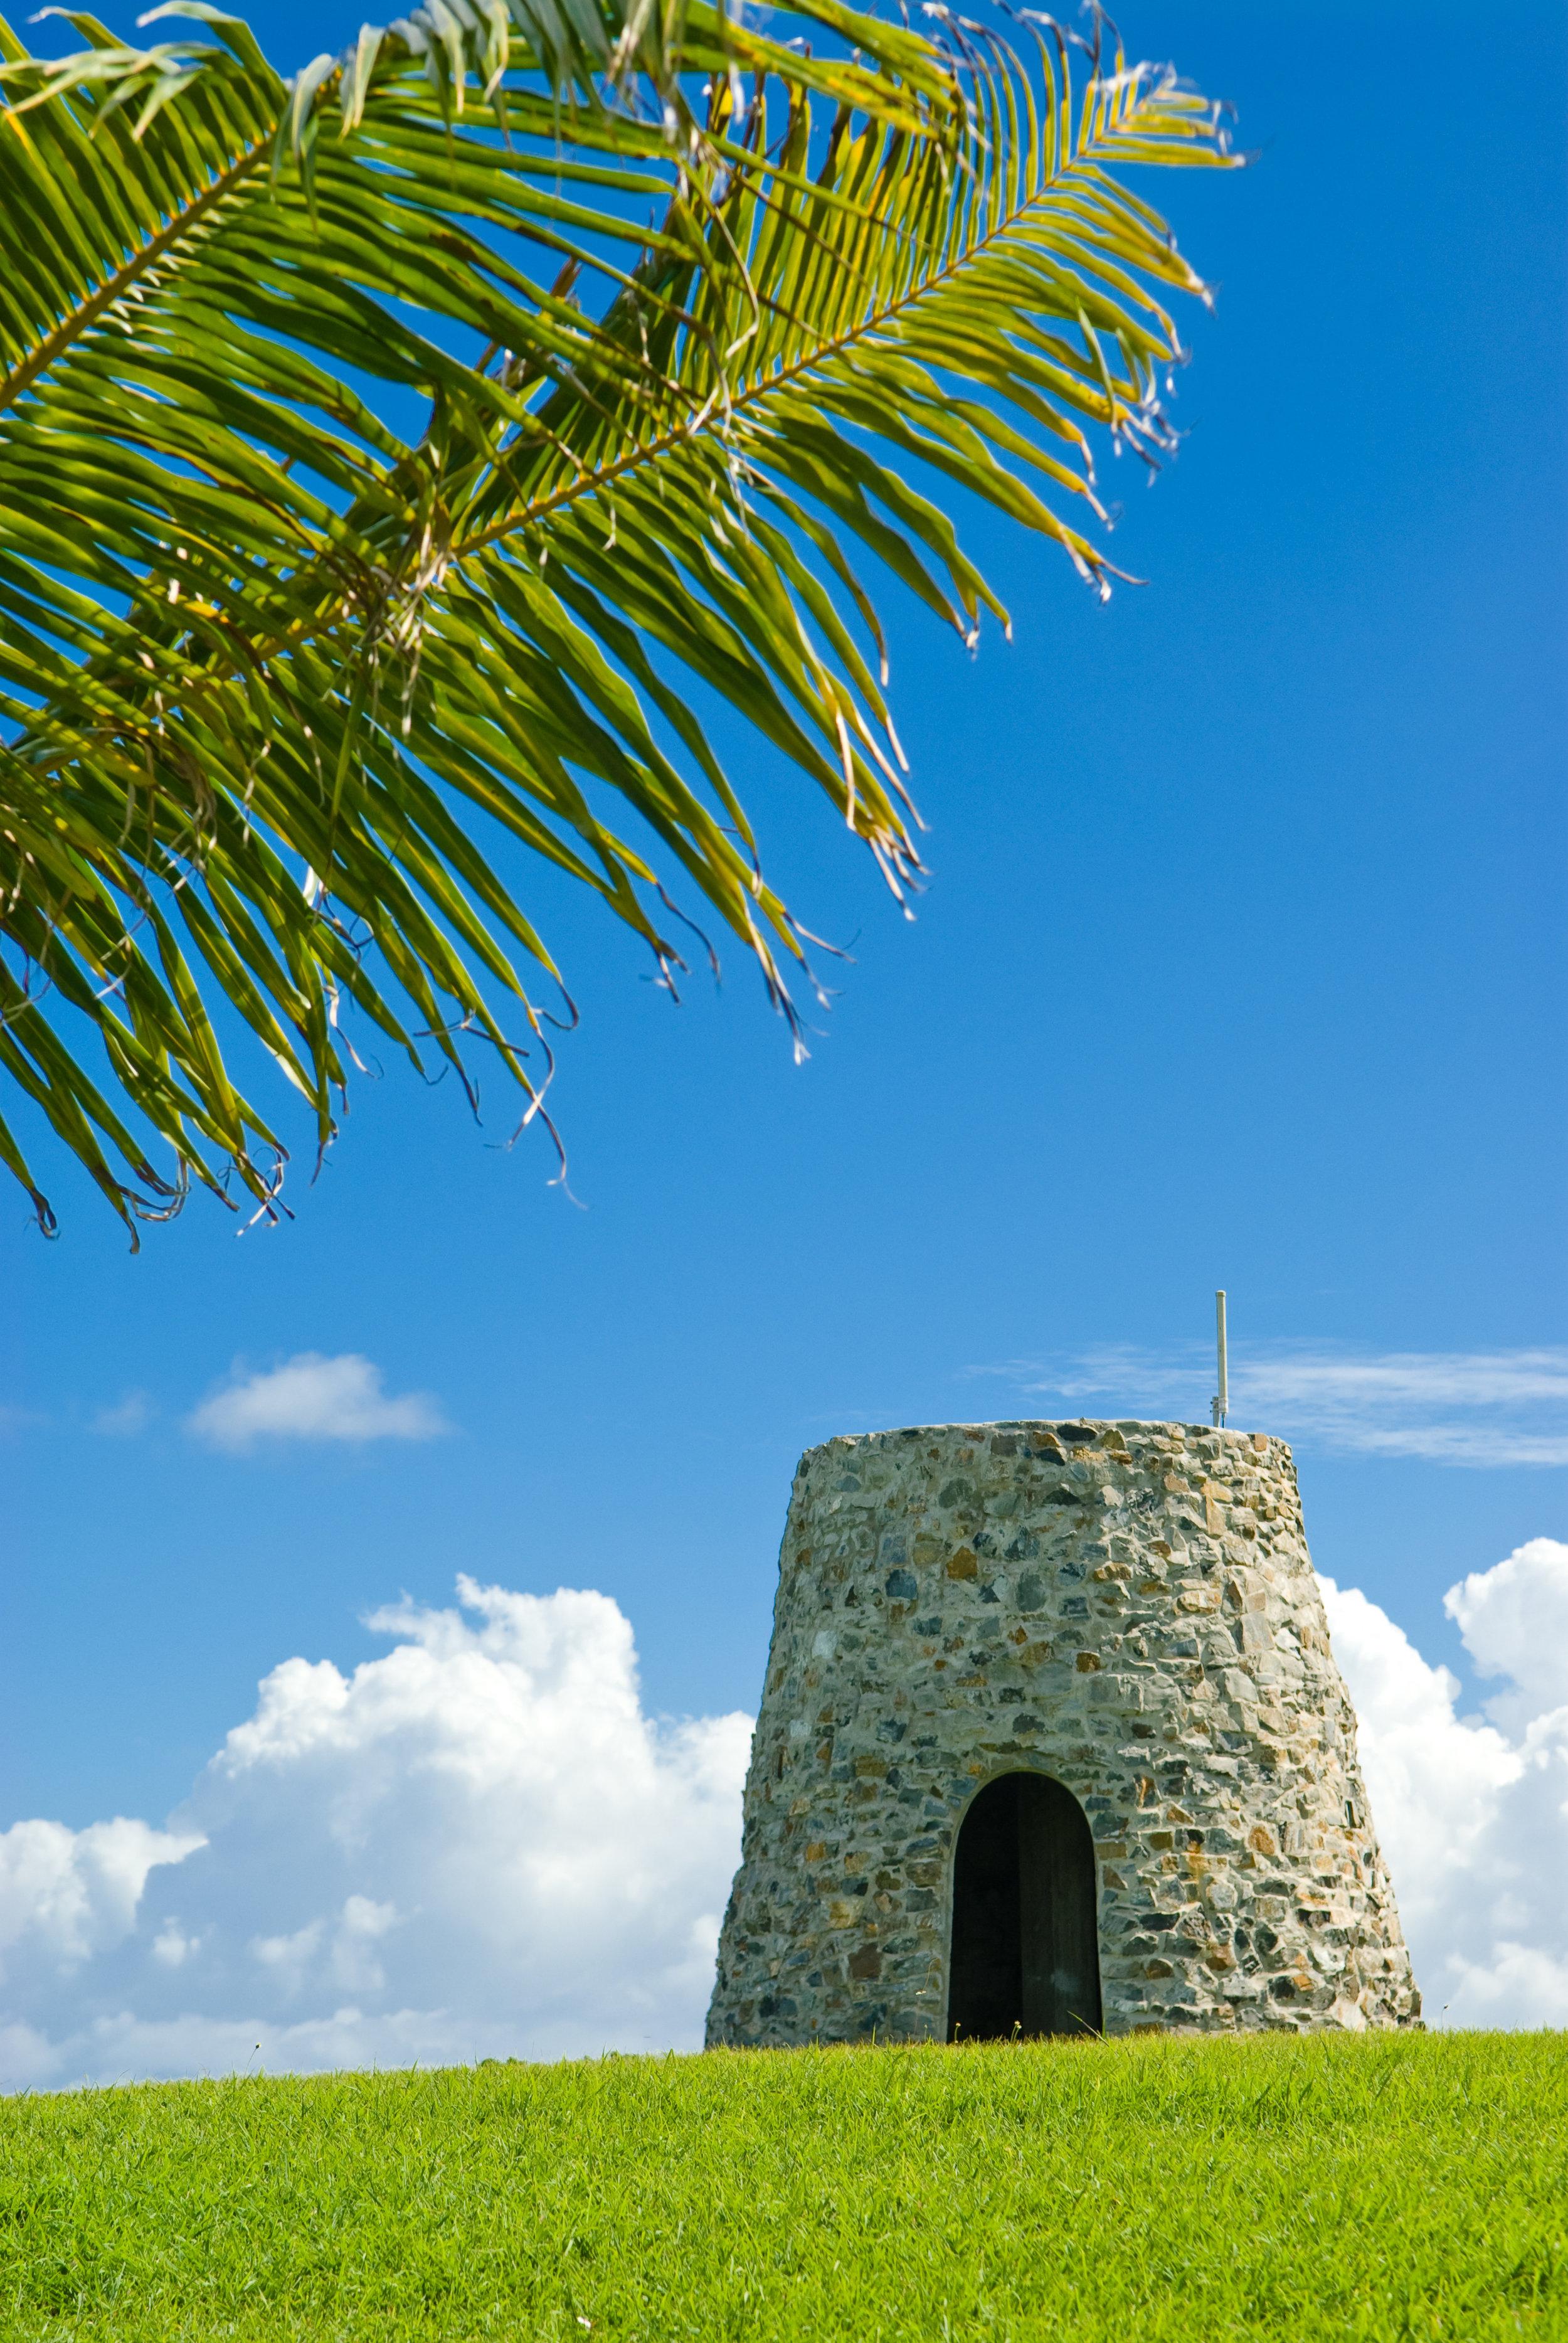 Virgin_Islands-4.jpg